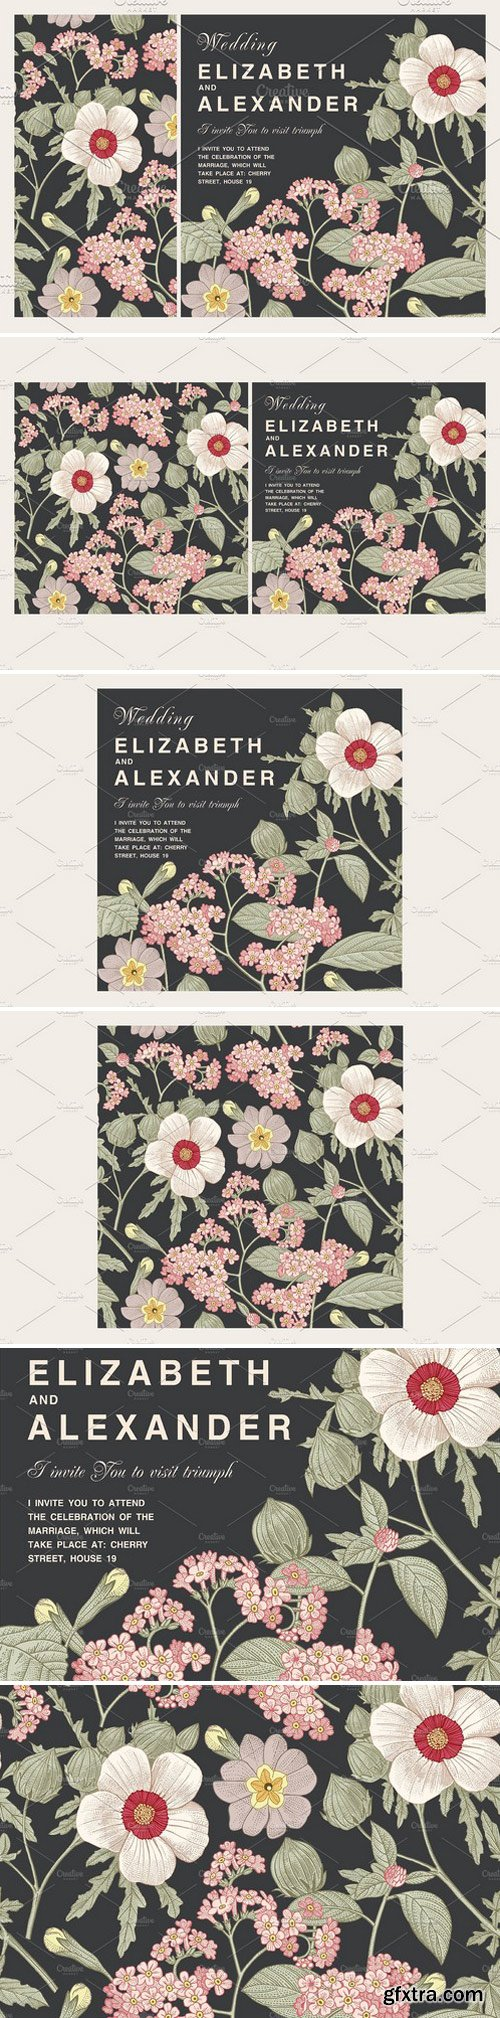 CM - Wedding Flowers Hibiscus Card Frame 2256875